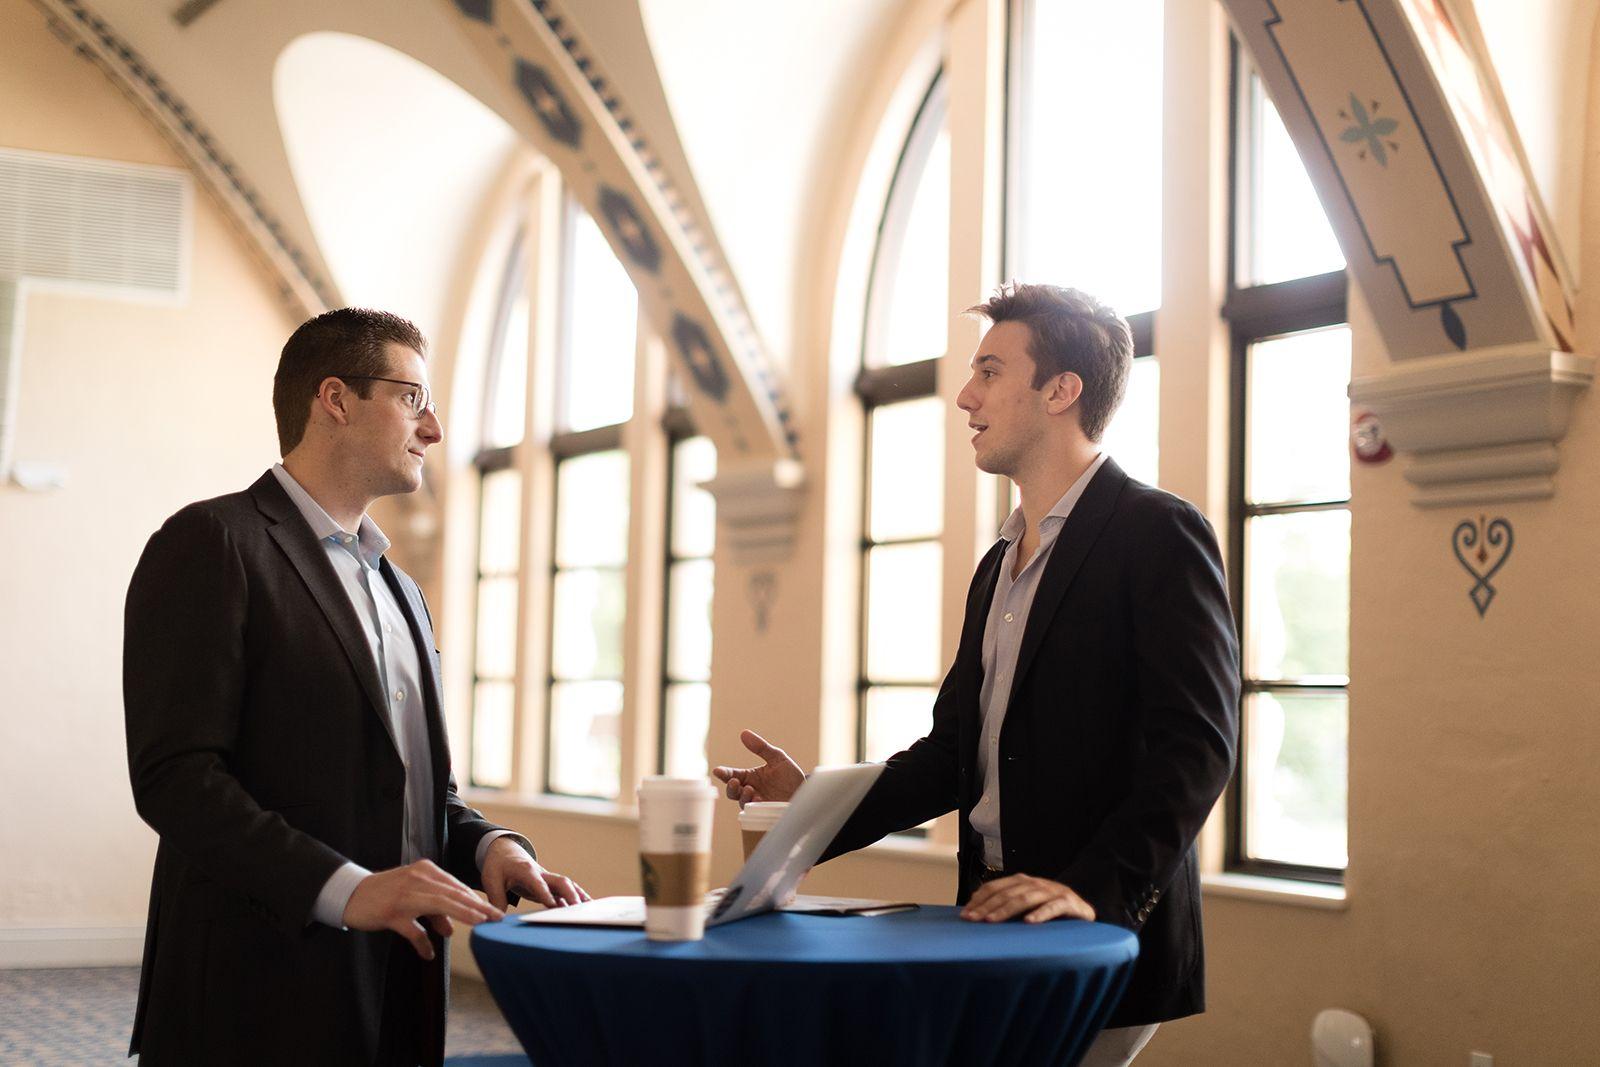 Brandon Burns '08 '09MBA and Harrison Loew '21 discuss careers in finance.